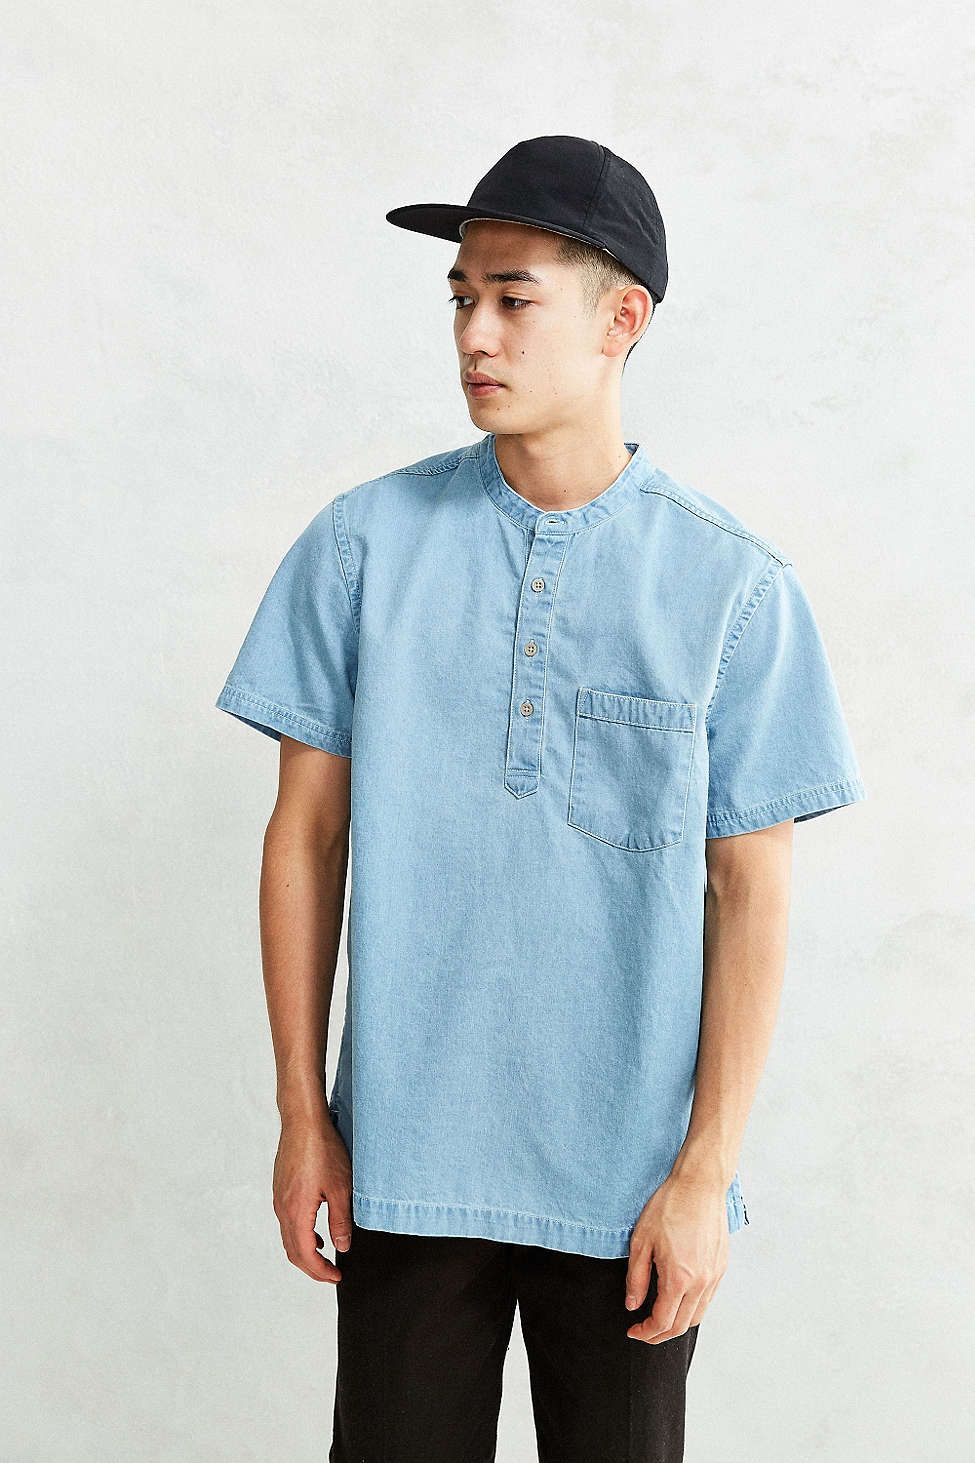 Flannel shirt and shorts men  CPO Denim Short Sleeve Popover Shirt  ue BLUE  Pinterest